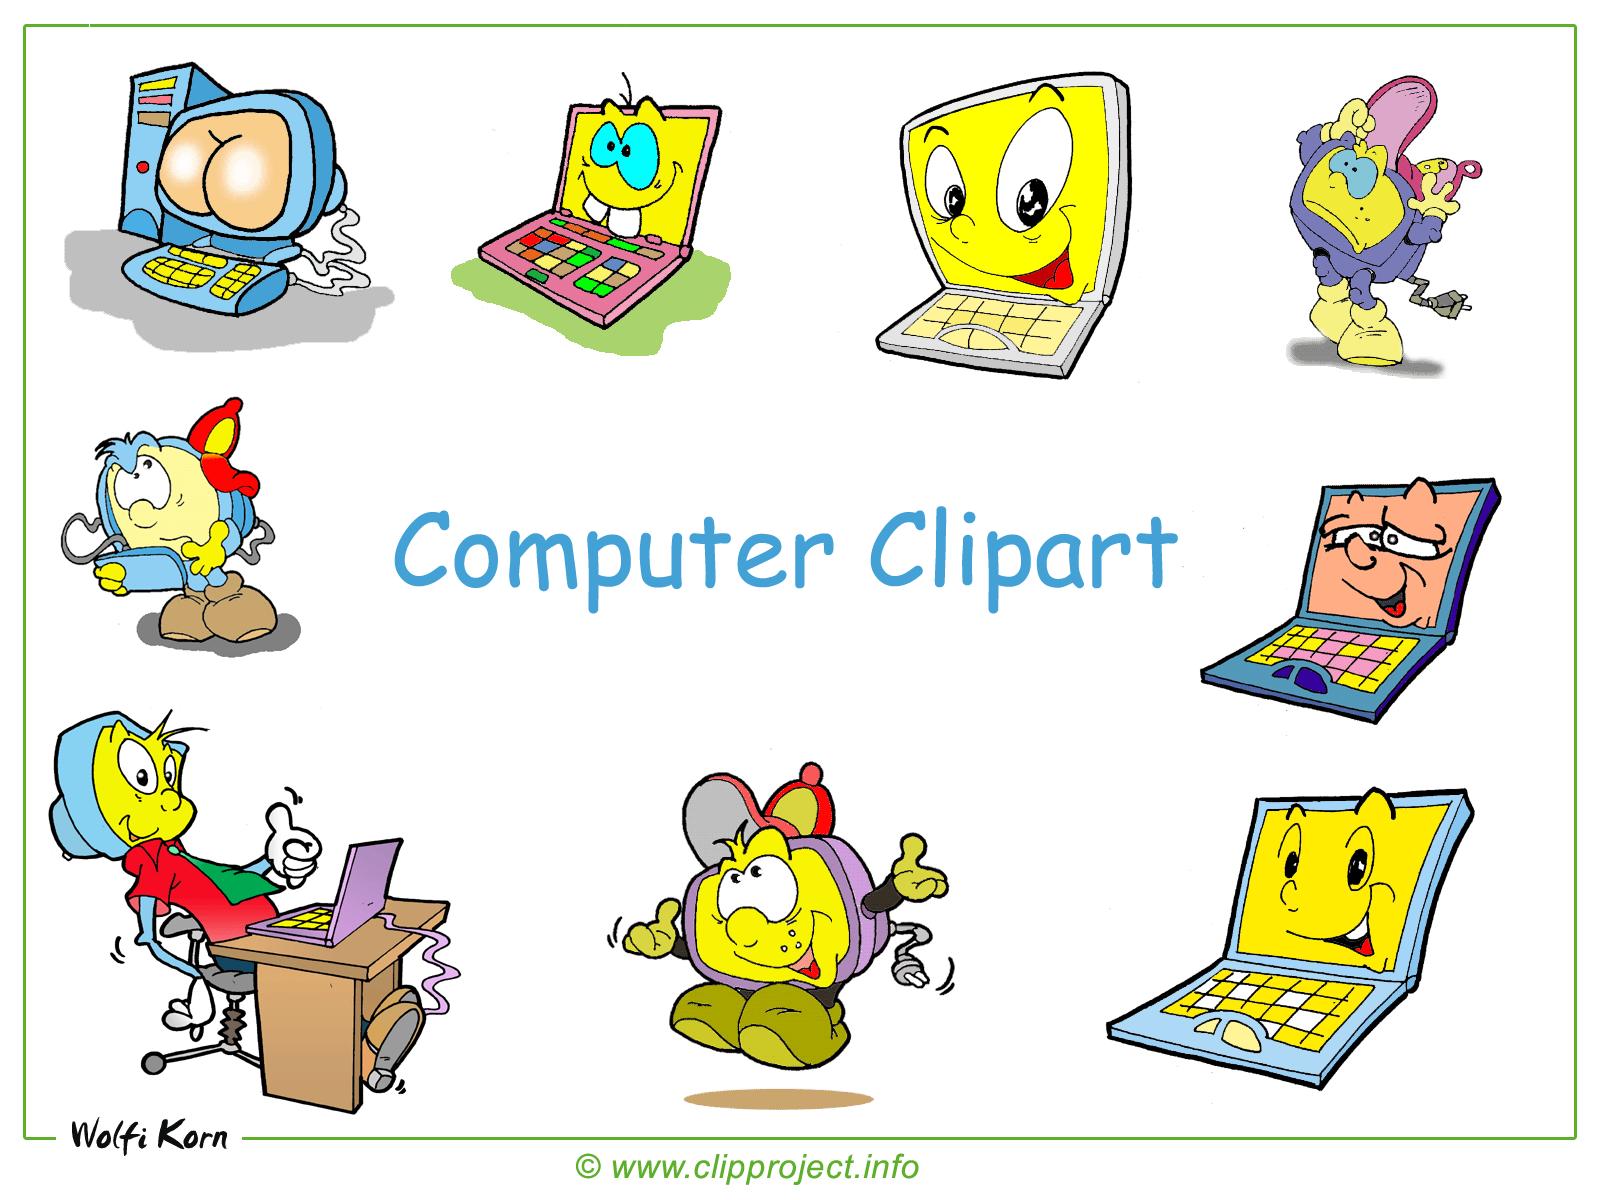 Desktop Backgrounds Clip Art Images in high Resolution for free.